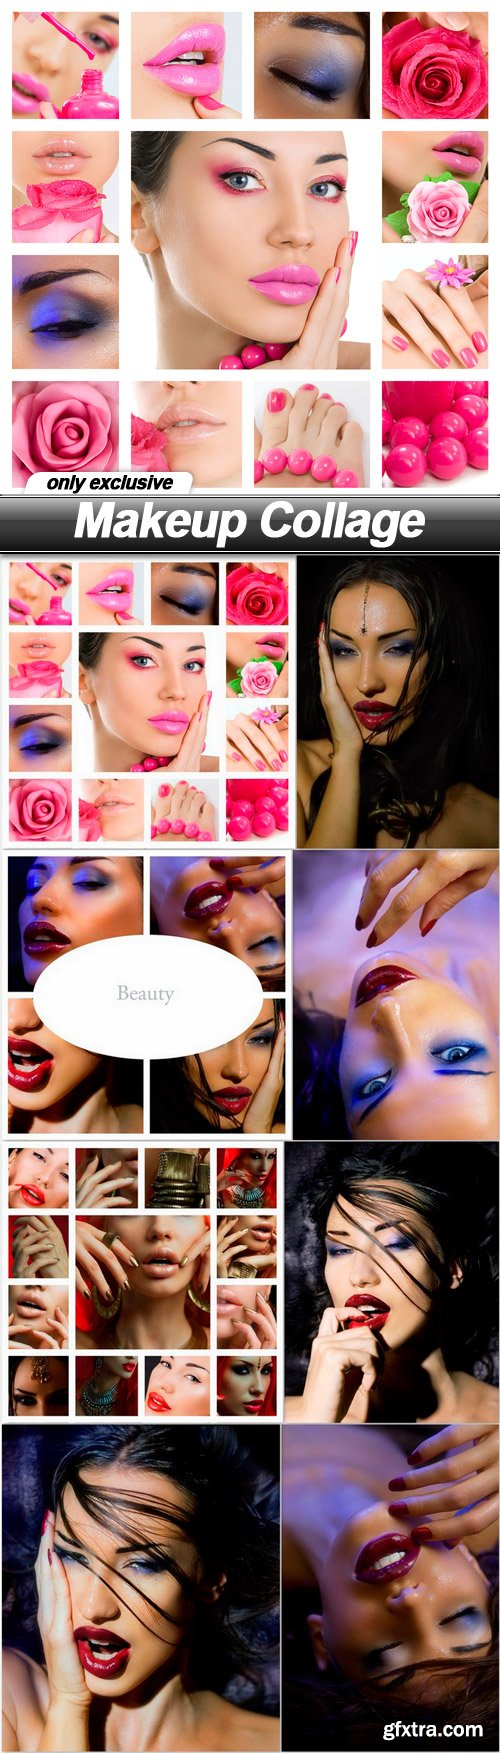 Makeup Collage - 8 UHQ JPEG